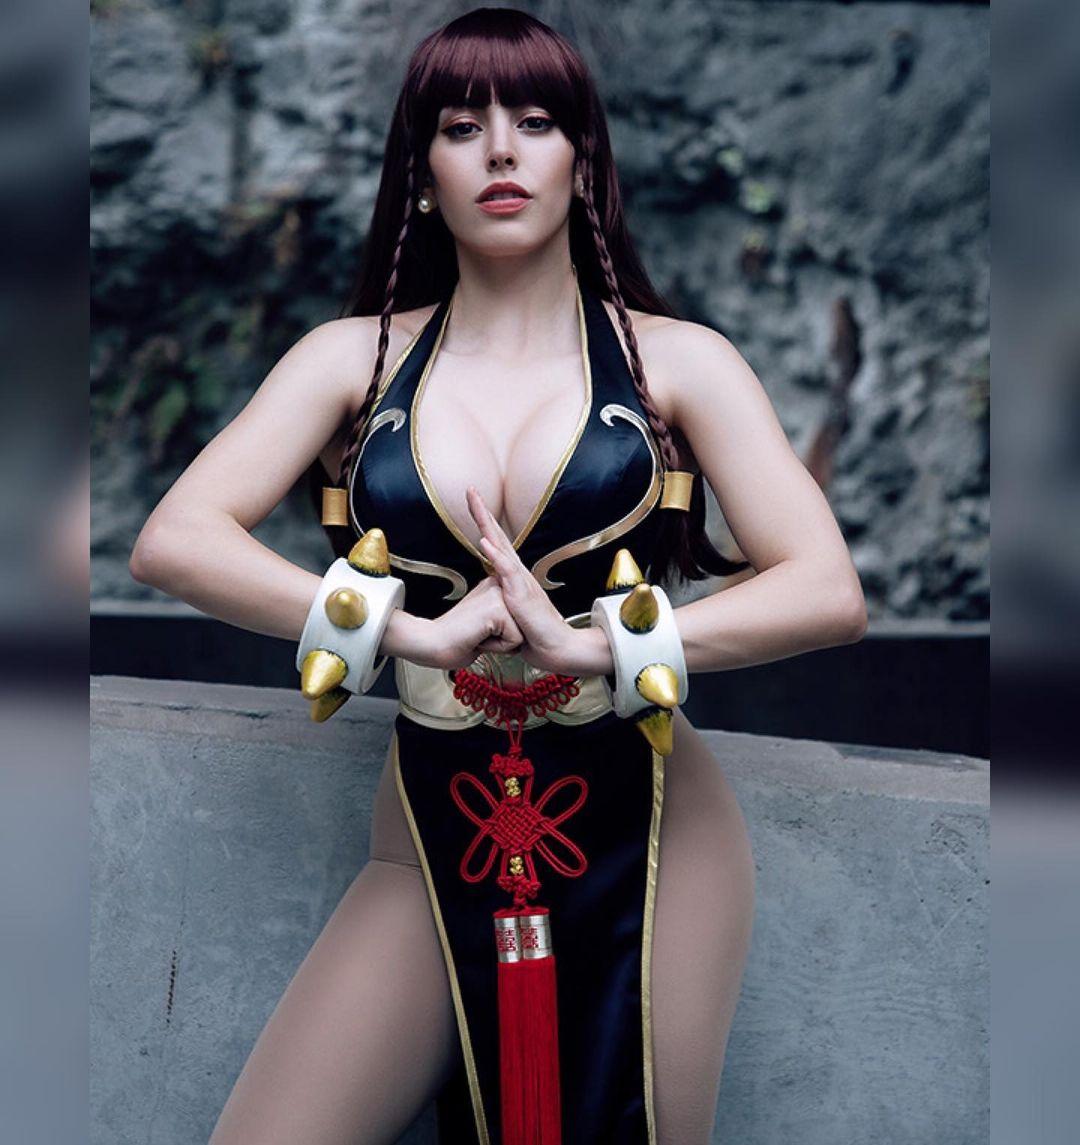 Nadyasonika As Chun-Li, Street Fighter